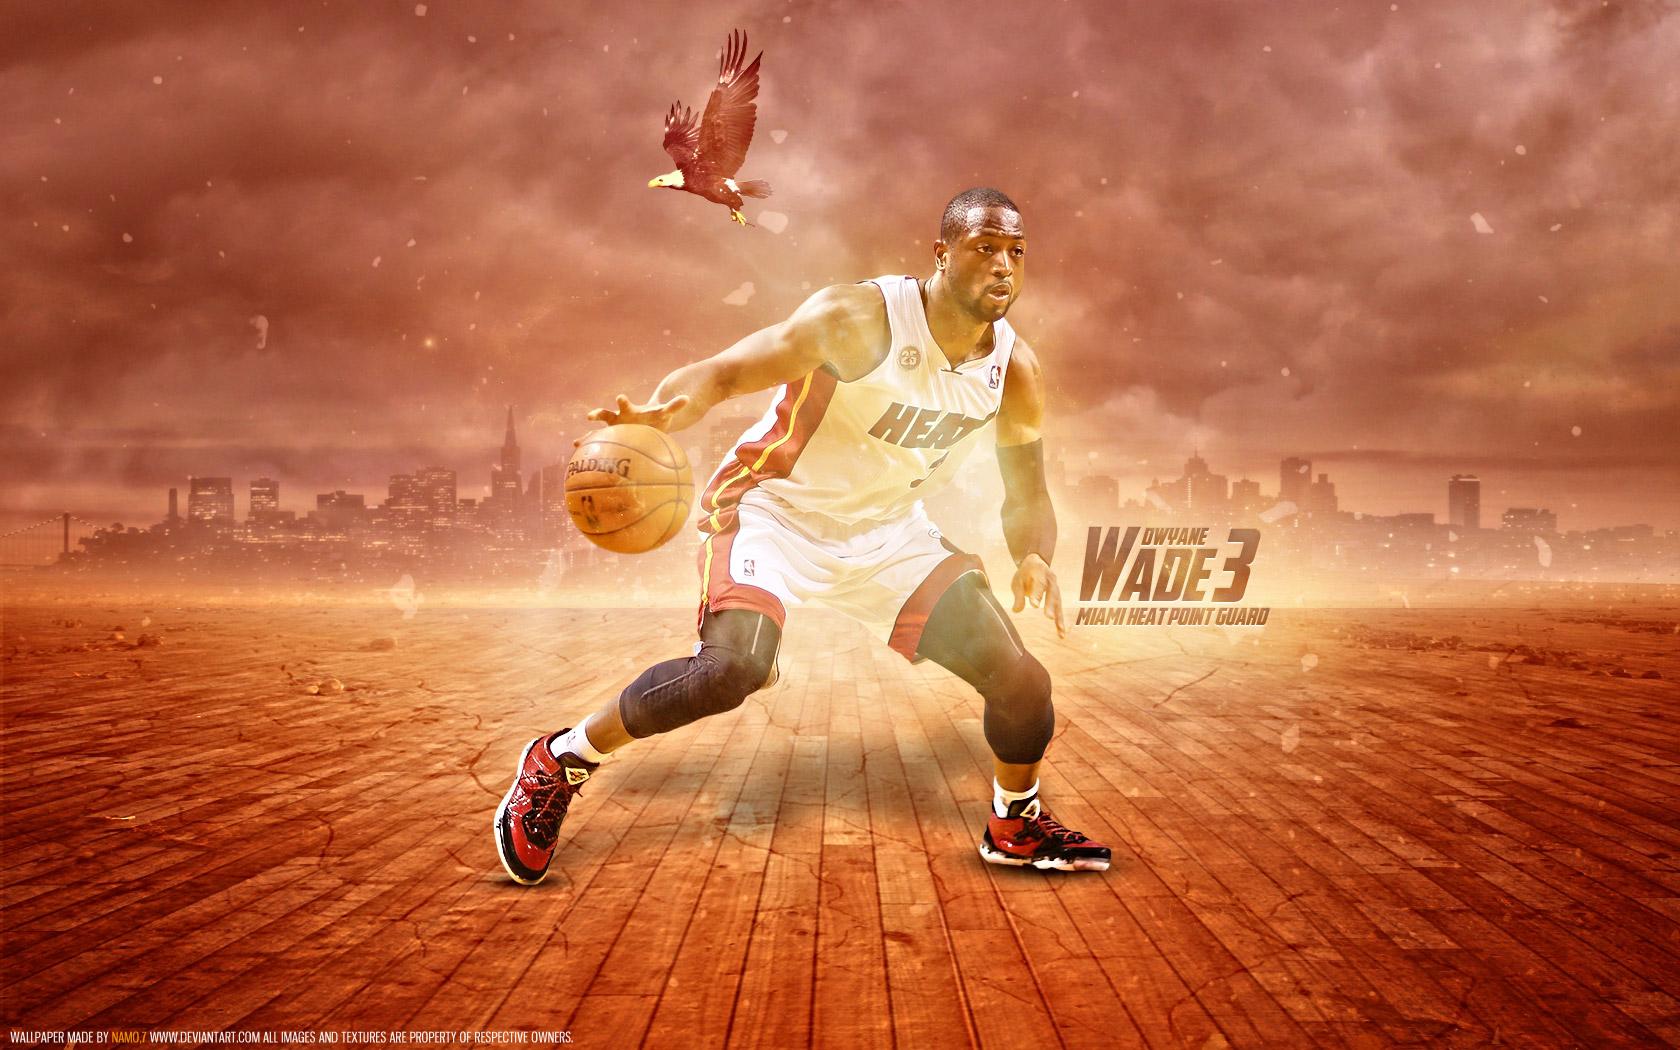 Dwyane Wade Heat 2013 1680x1050 Wallpaper   Basketball Wallpapers 1680x1050